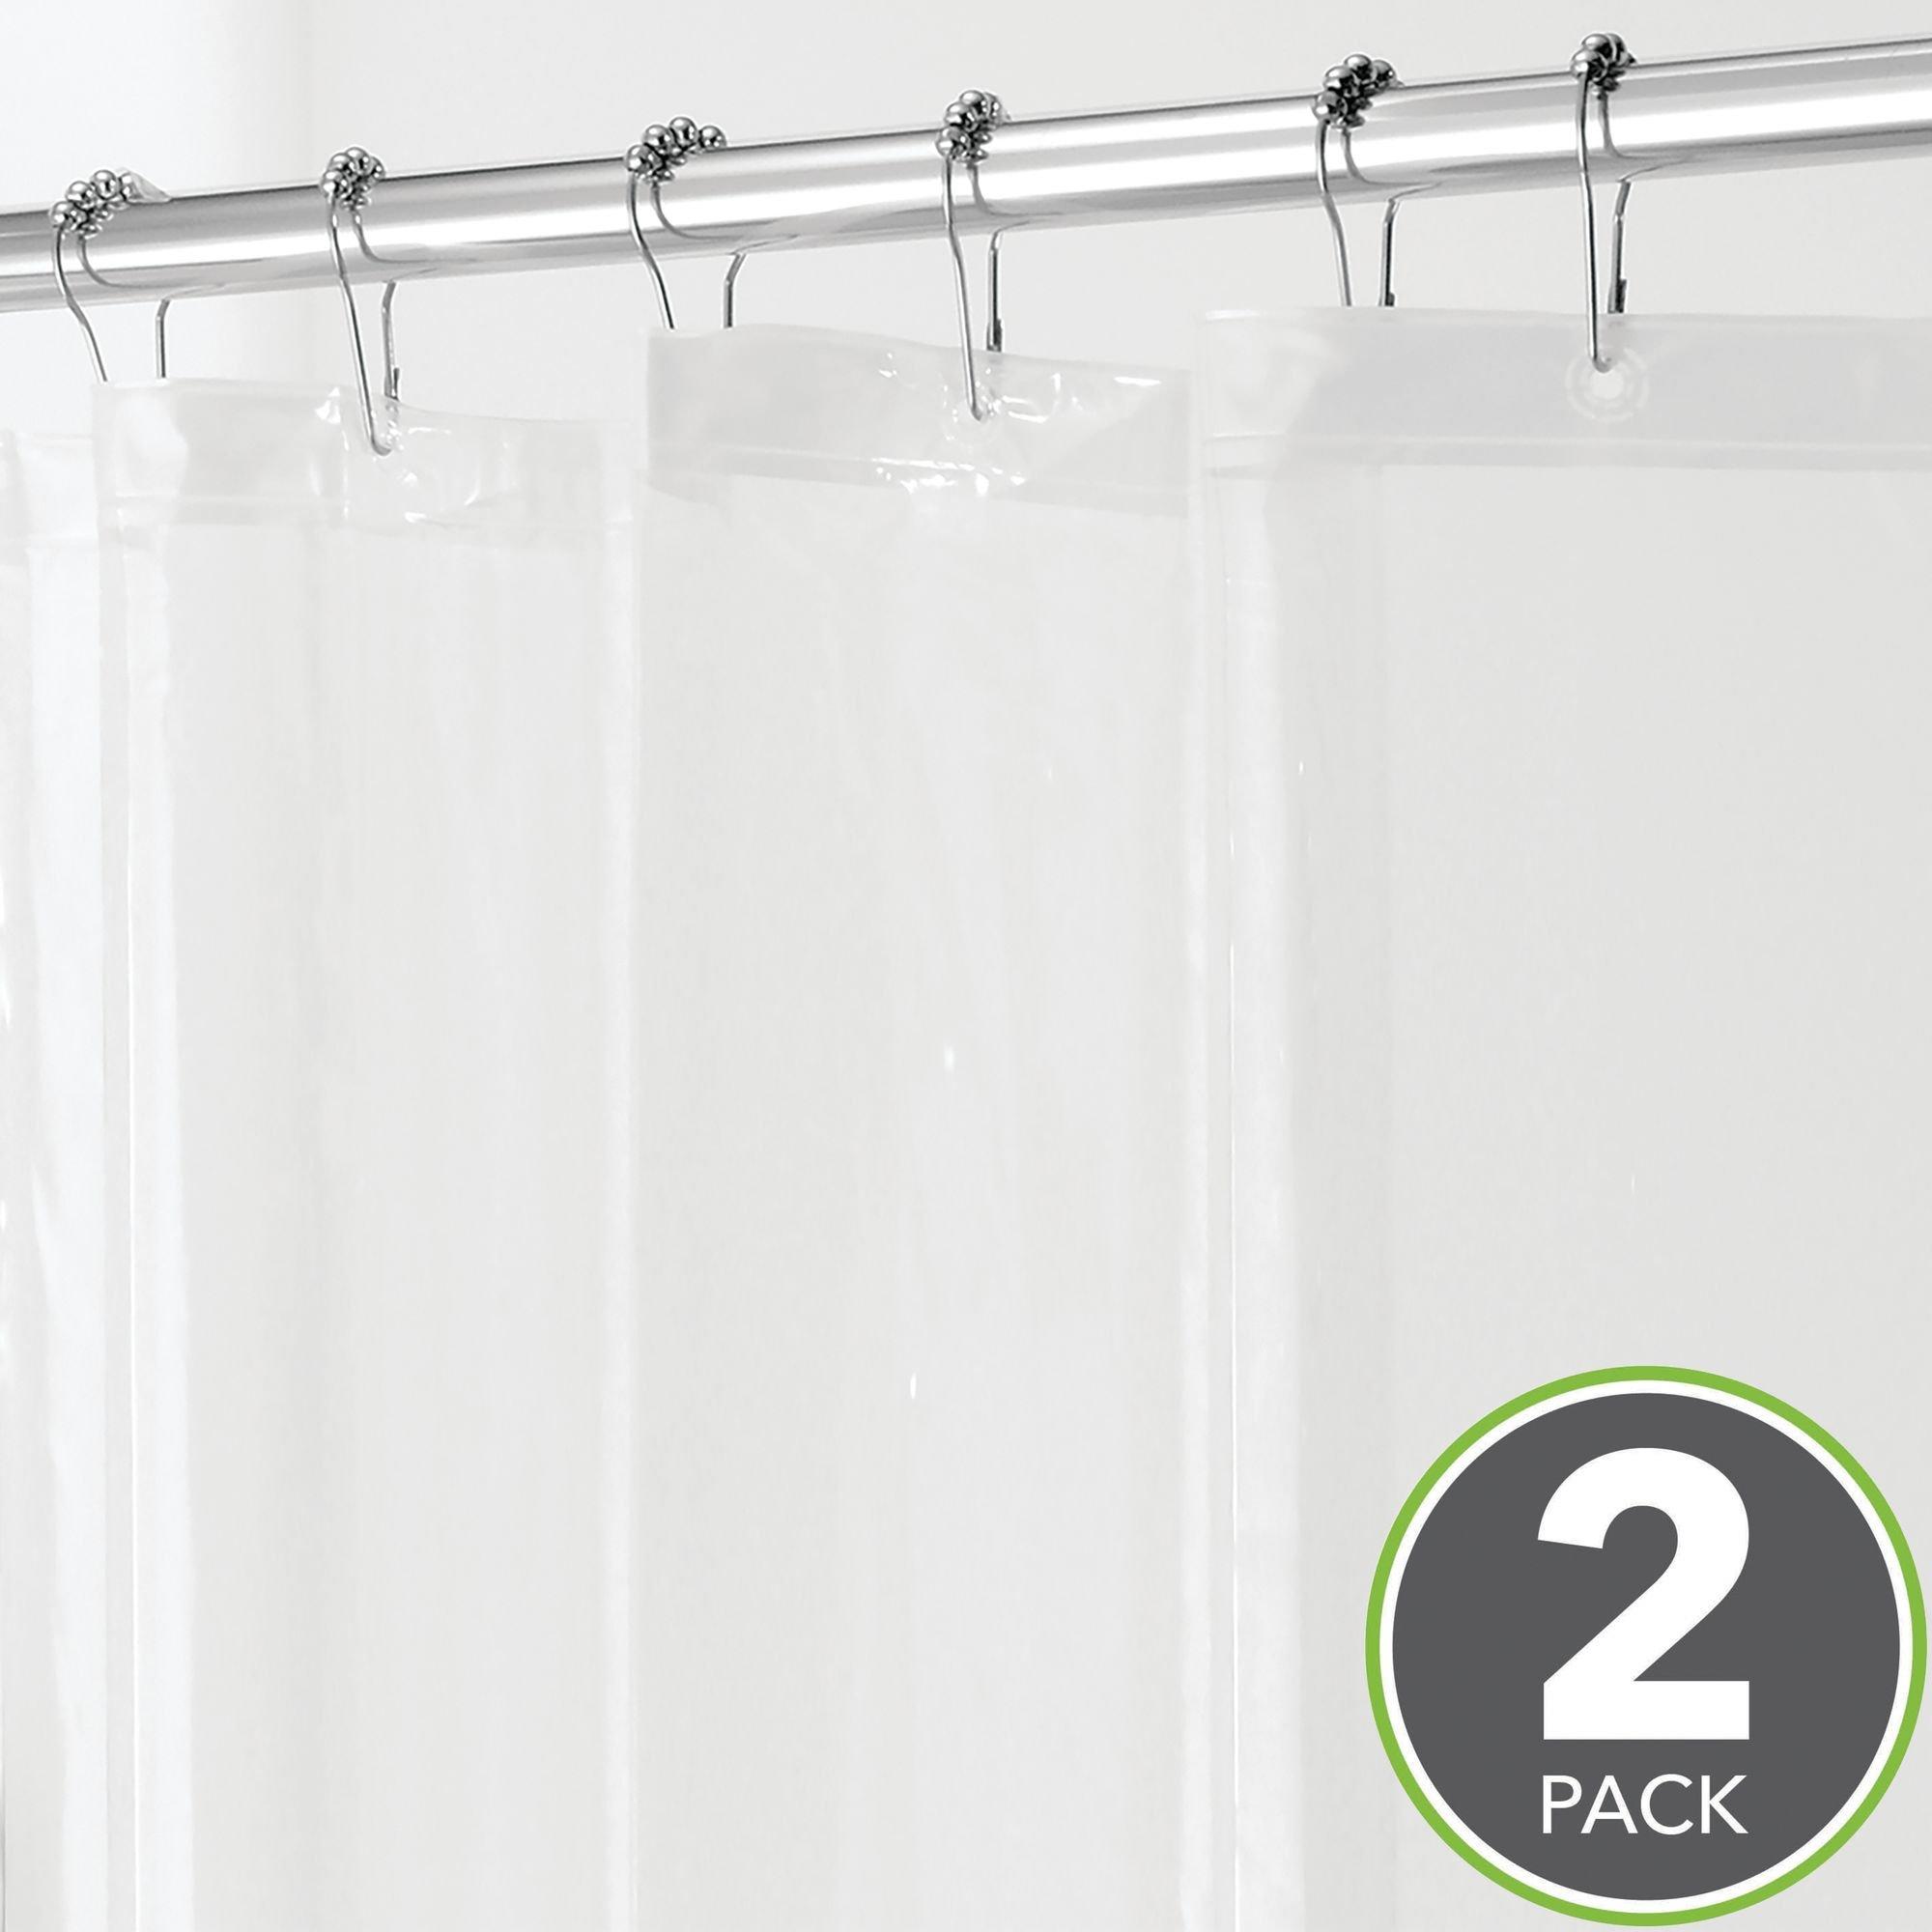 "mDesign Waterproof, Mold/Mildew Resistant, Heavy Duty PEVA Shower Curtain Liner for Bathroom Showers and Bathtubs - No Odor, Chlorine Free - 3 Gauge, 72"" x 72"", Pack of 2, Clear"